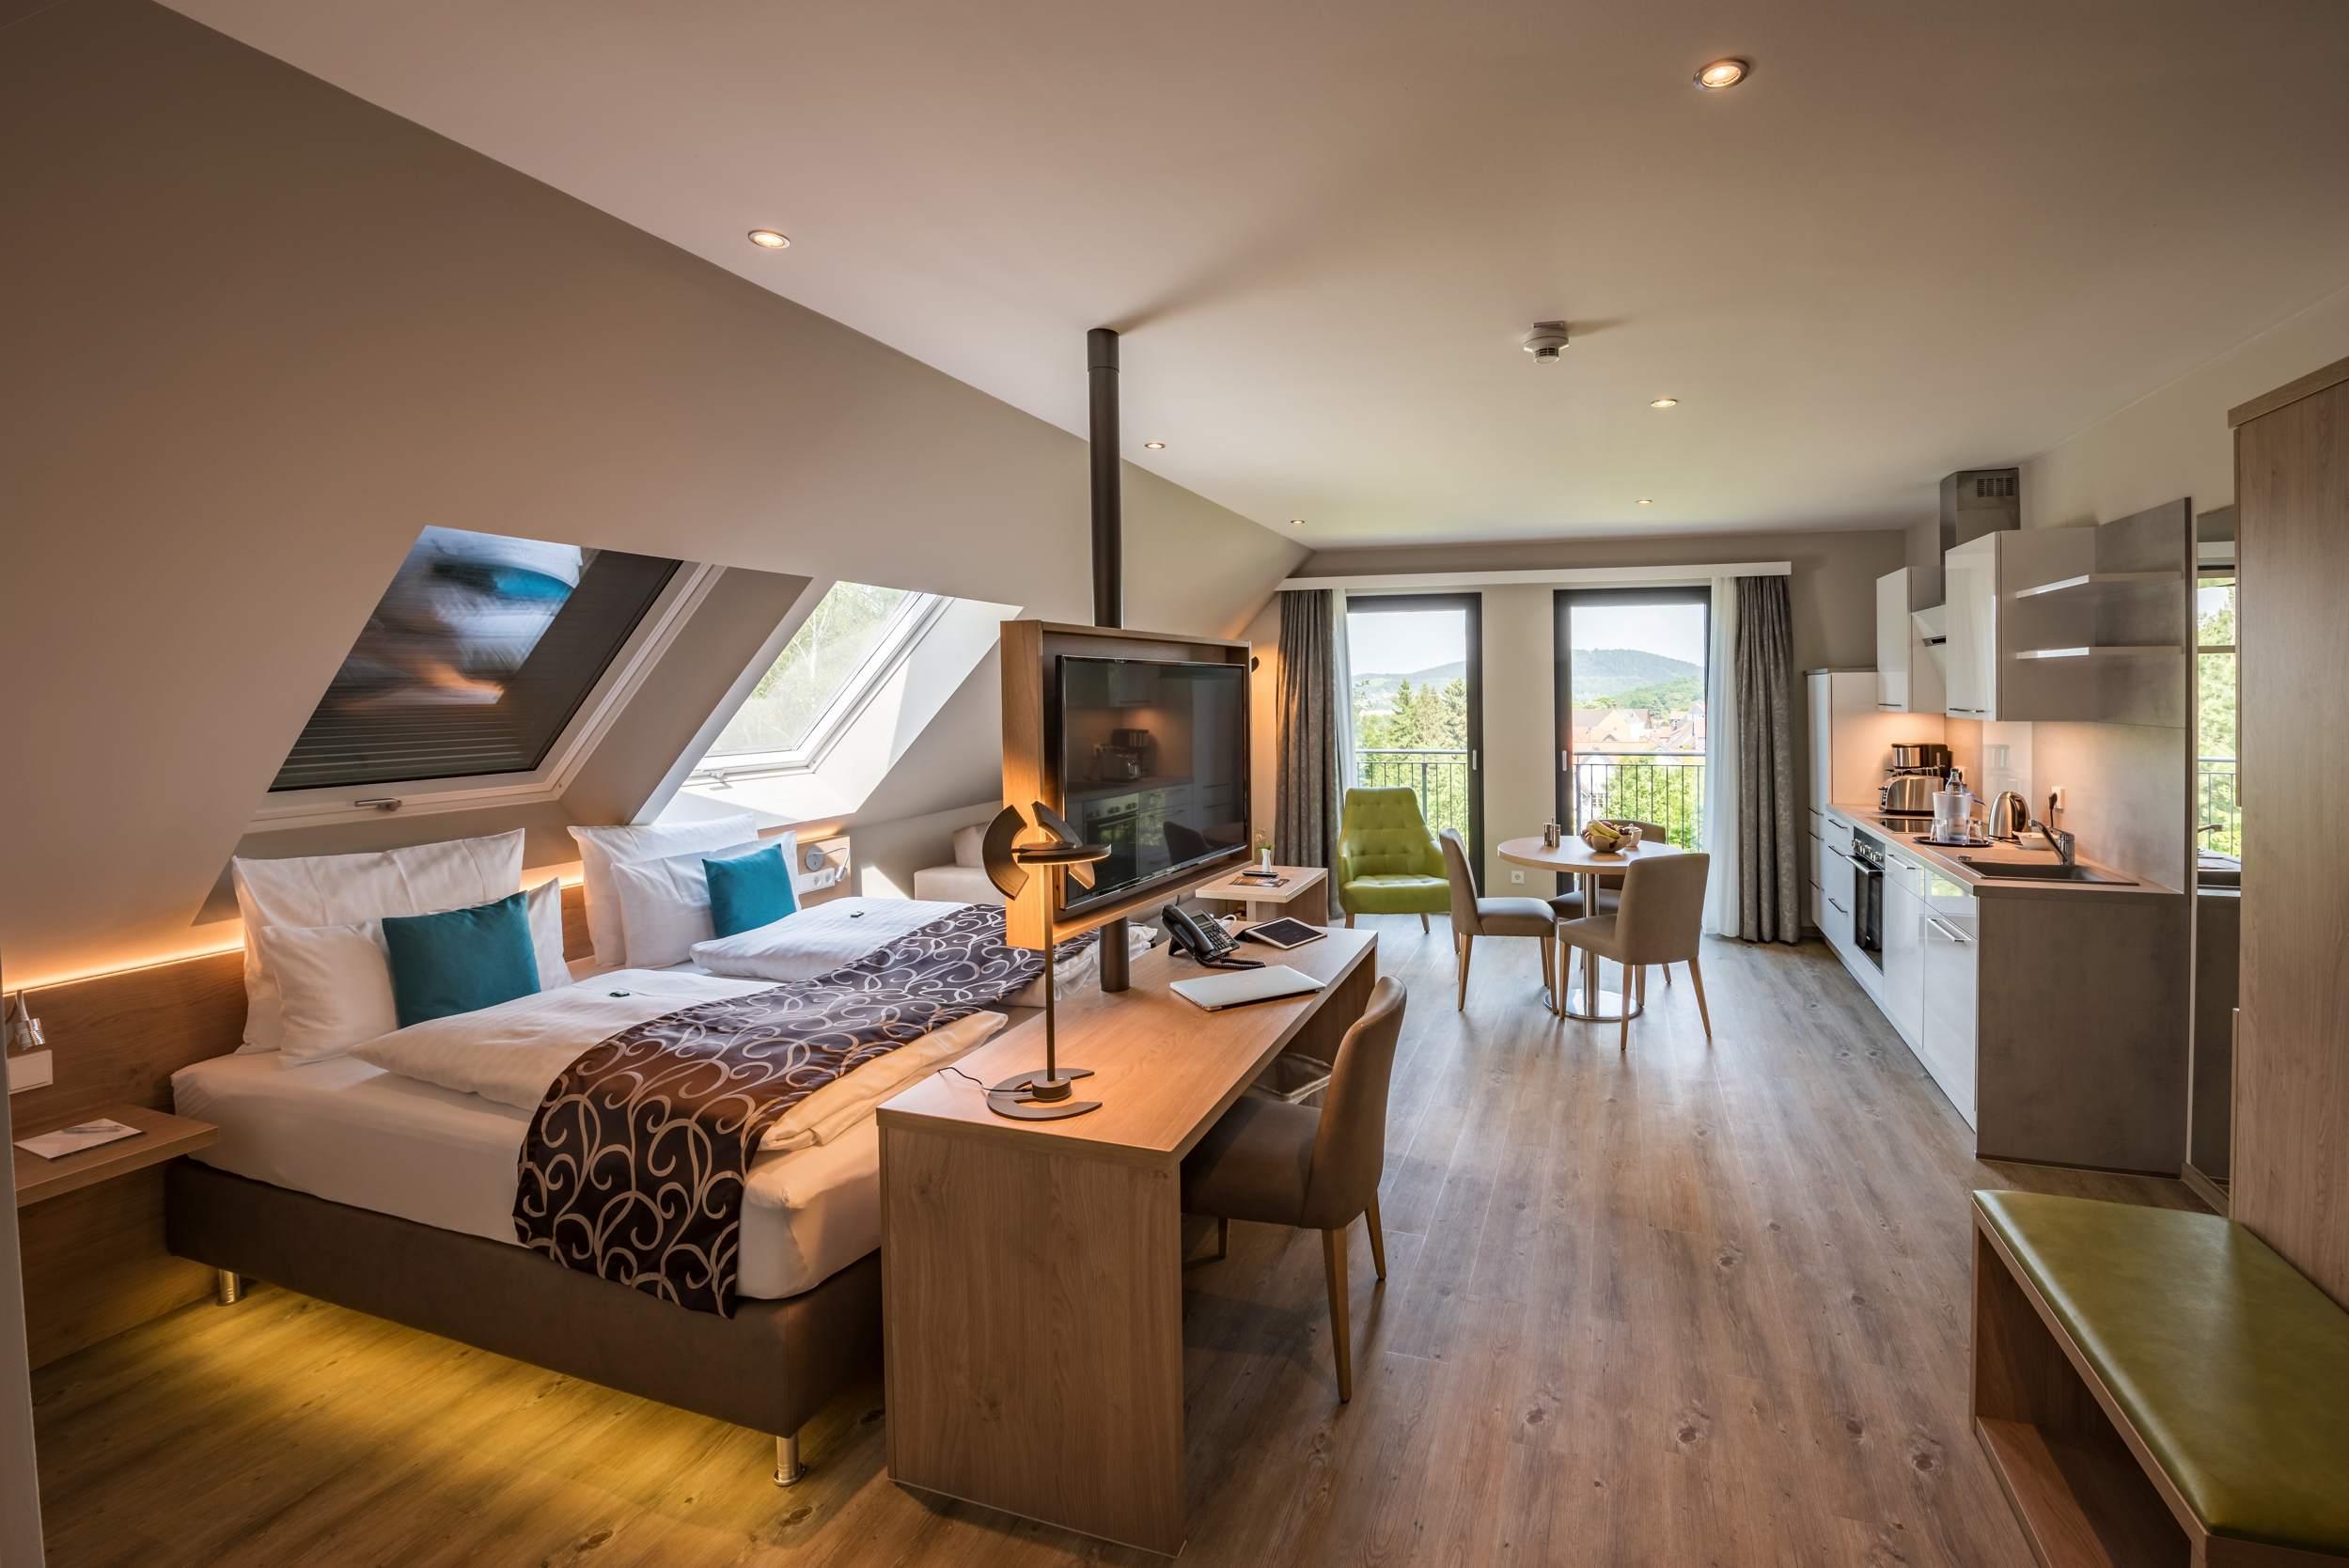 Hotel Villa Saxer in Goslar - Appartement